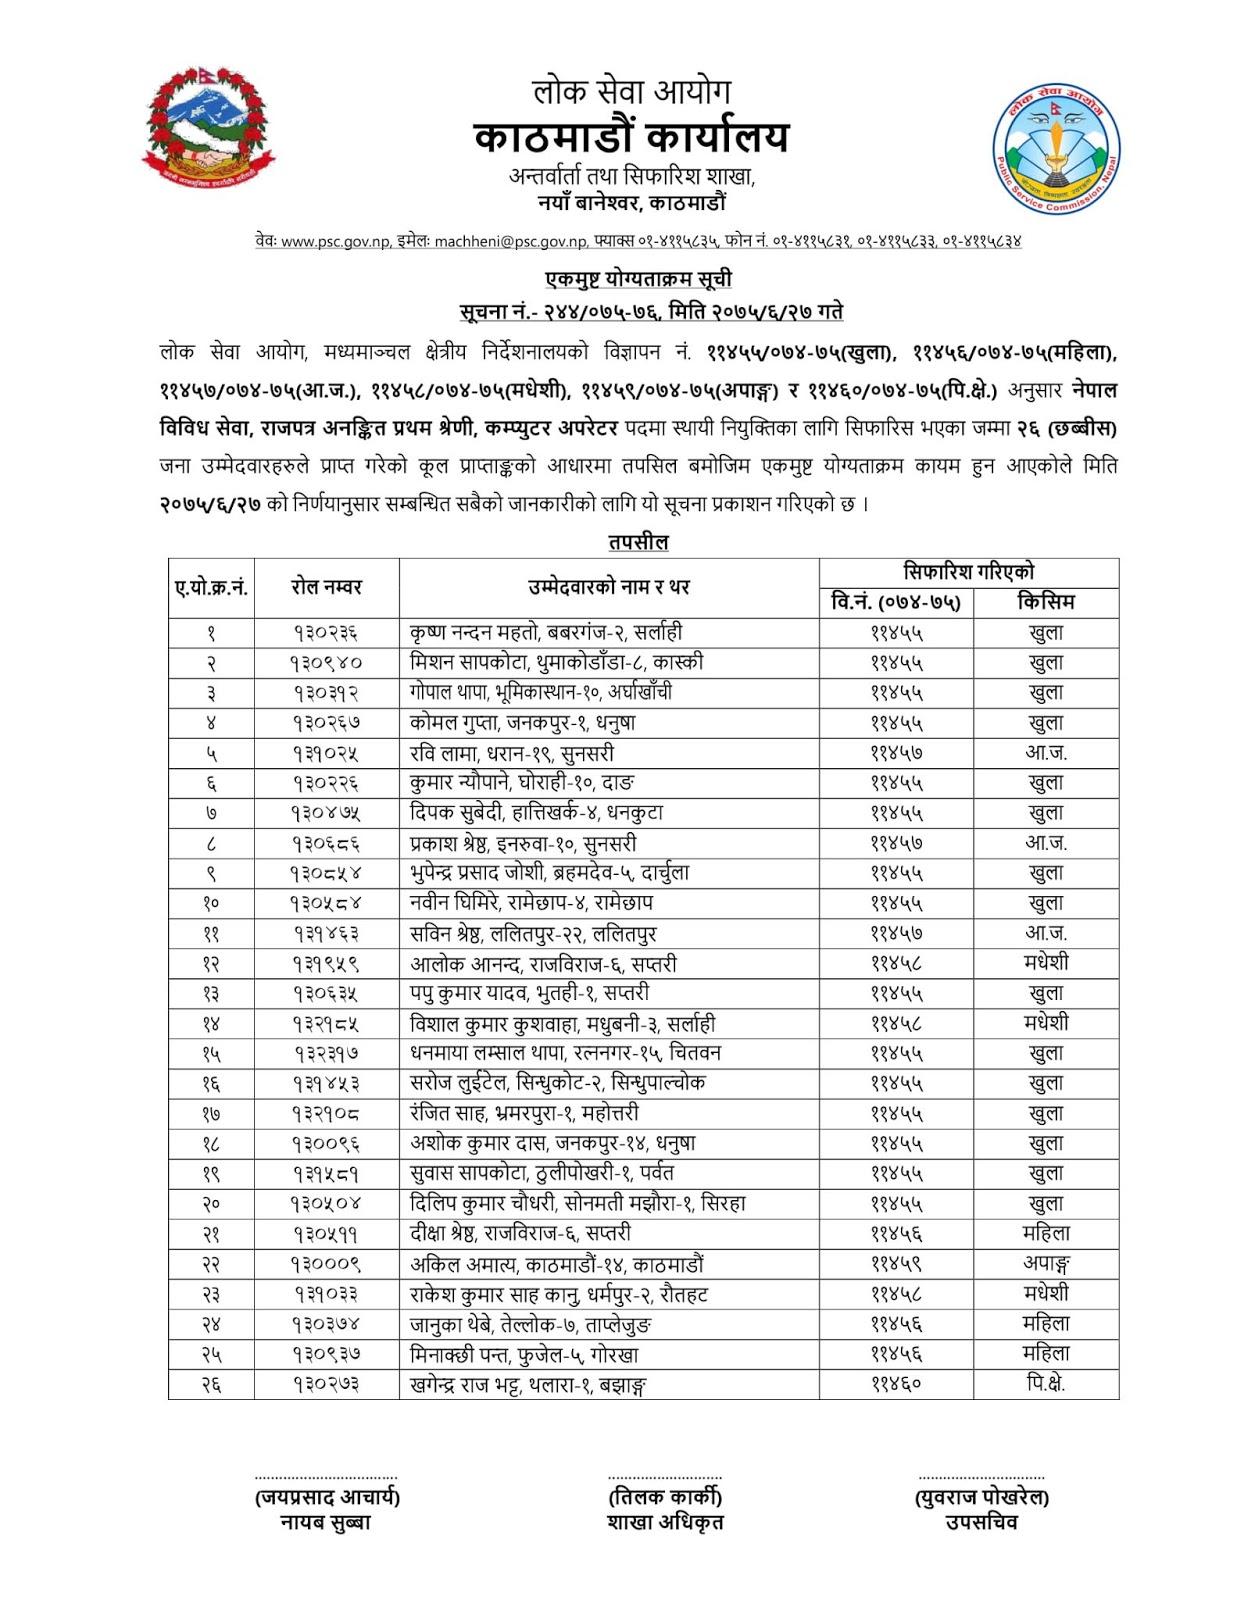 Assistant - Sahayek Computer Operator 2075 of Kathmandu Result is Published